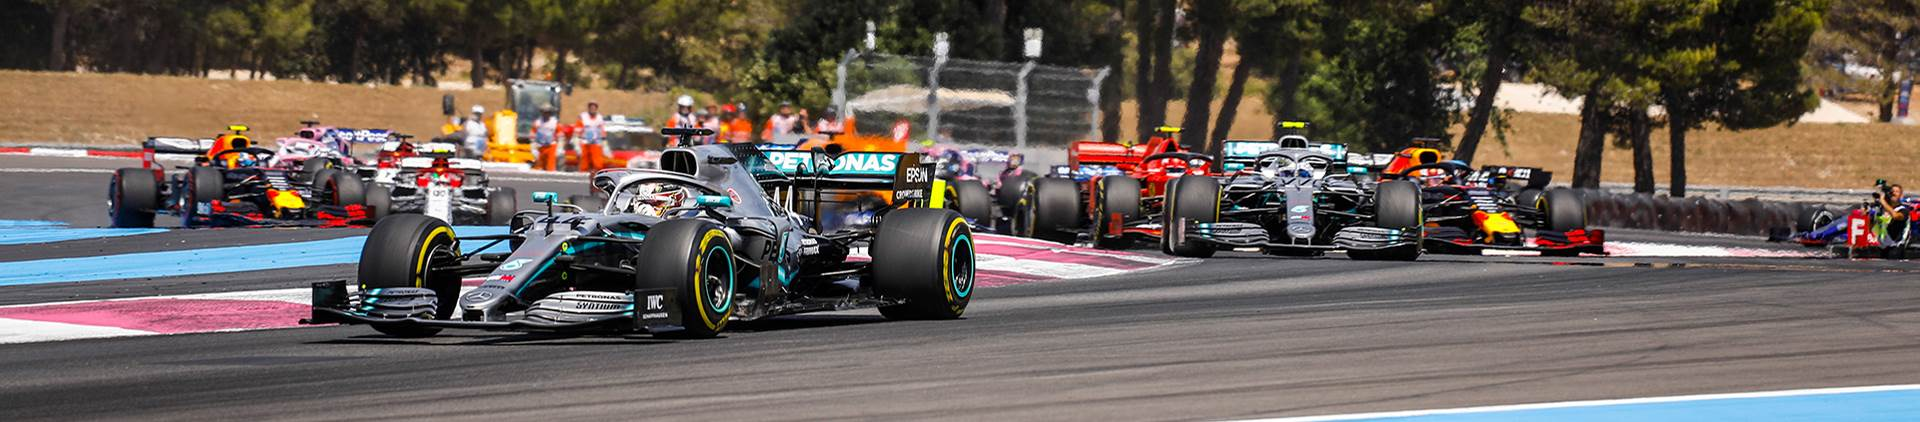 F1 France